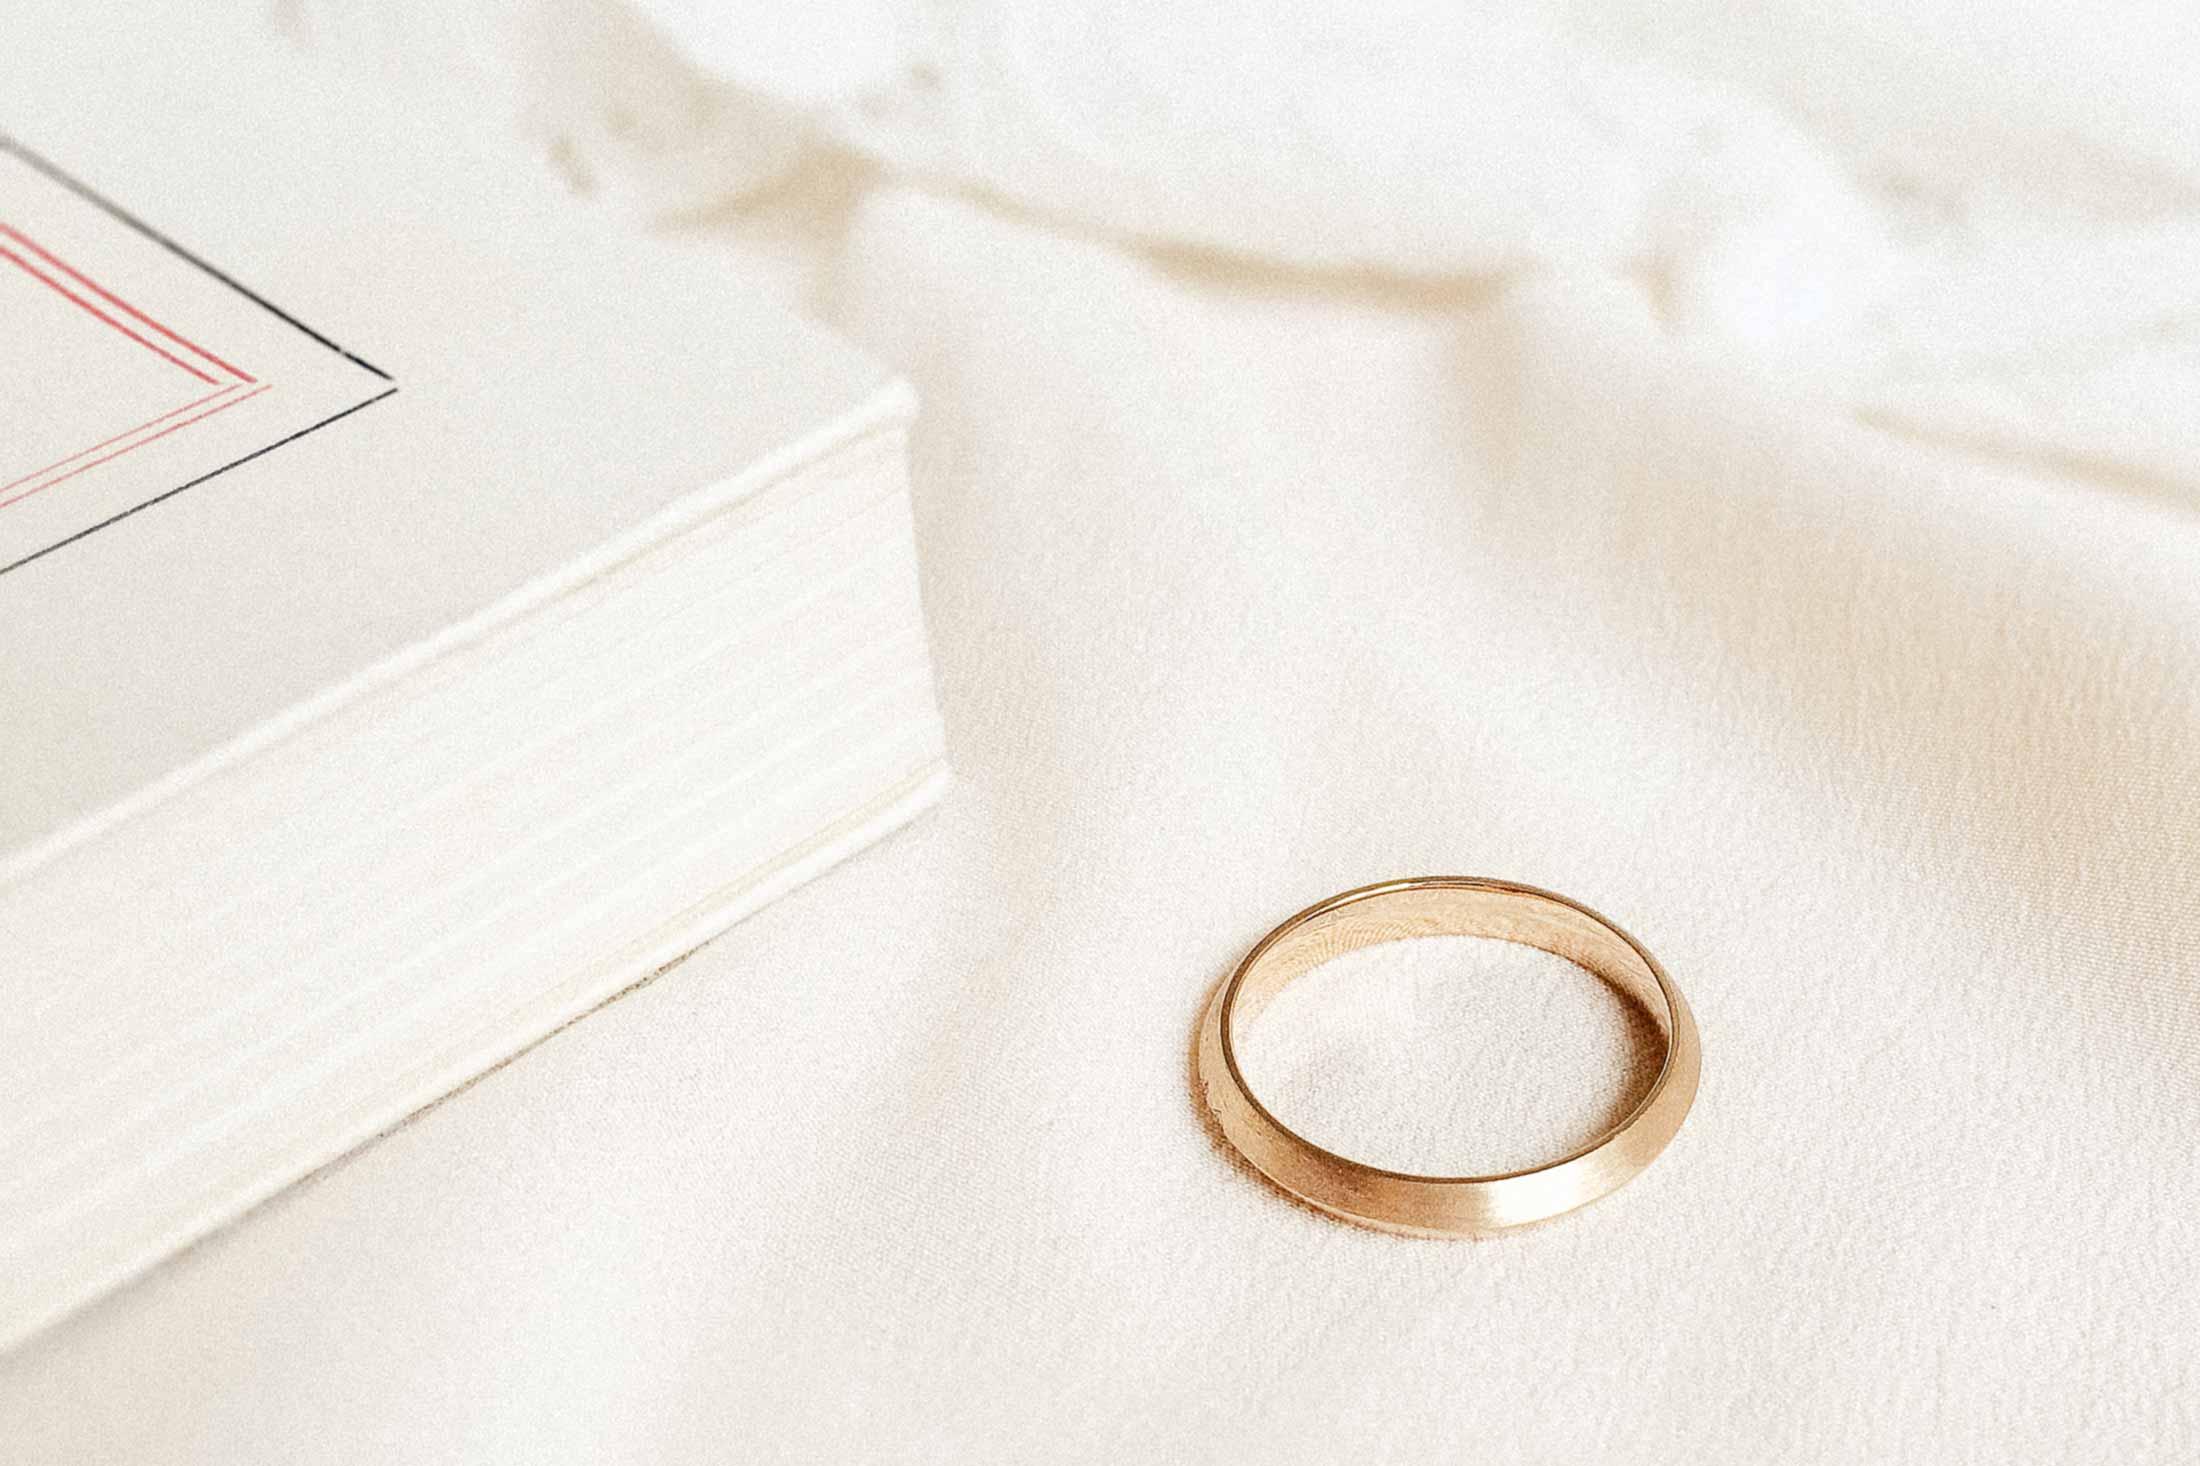 bien-choisir-alliances-mariage-gemmyo